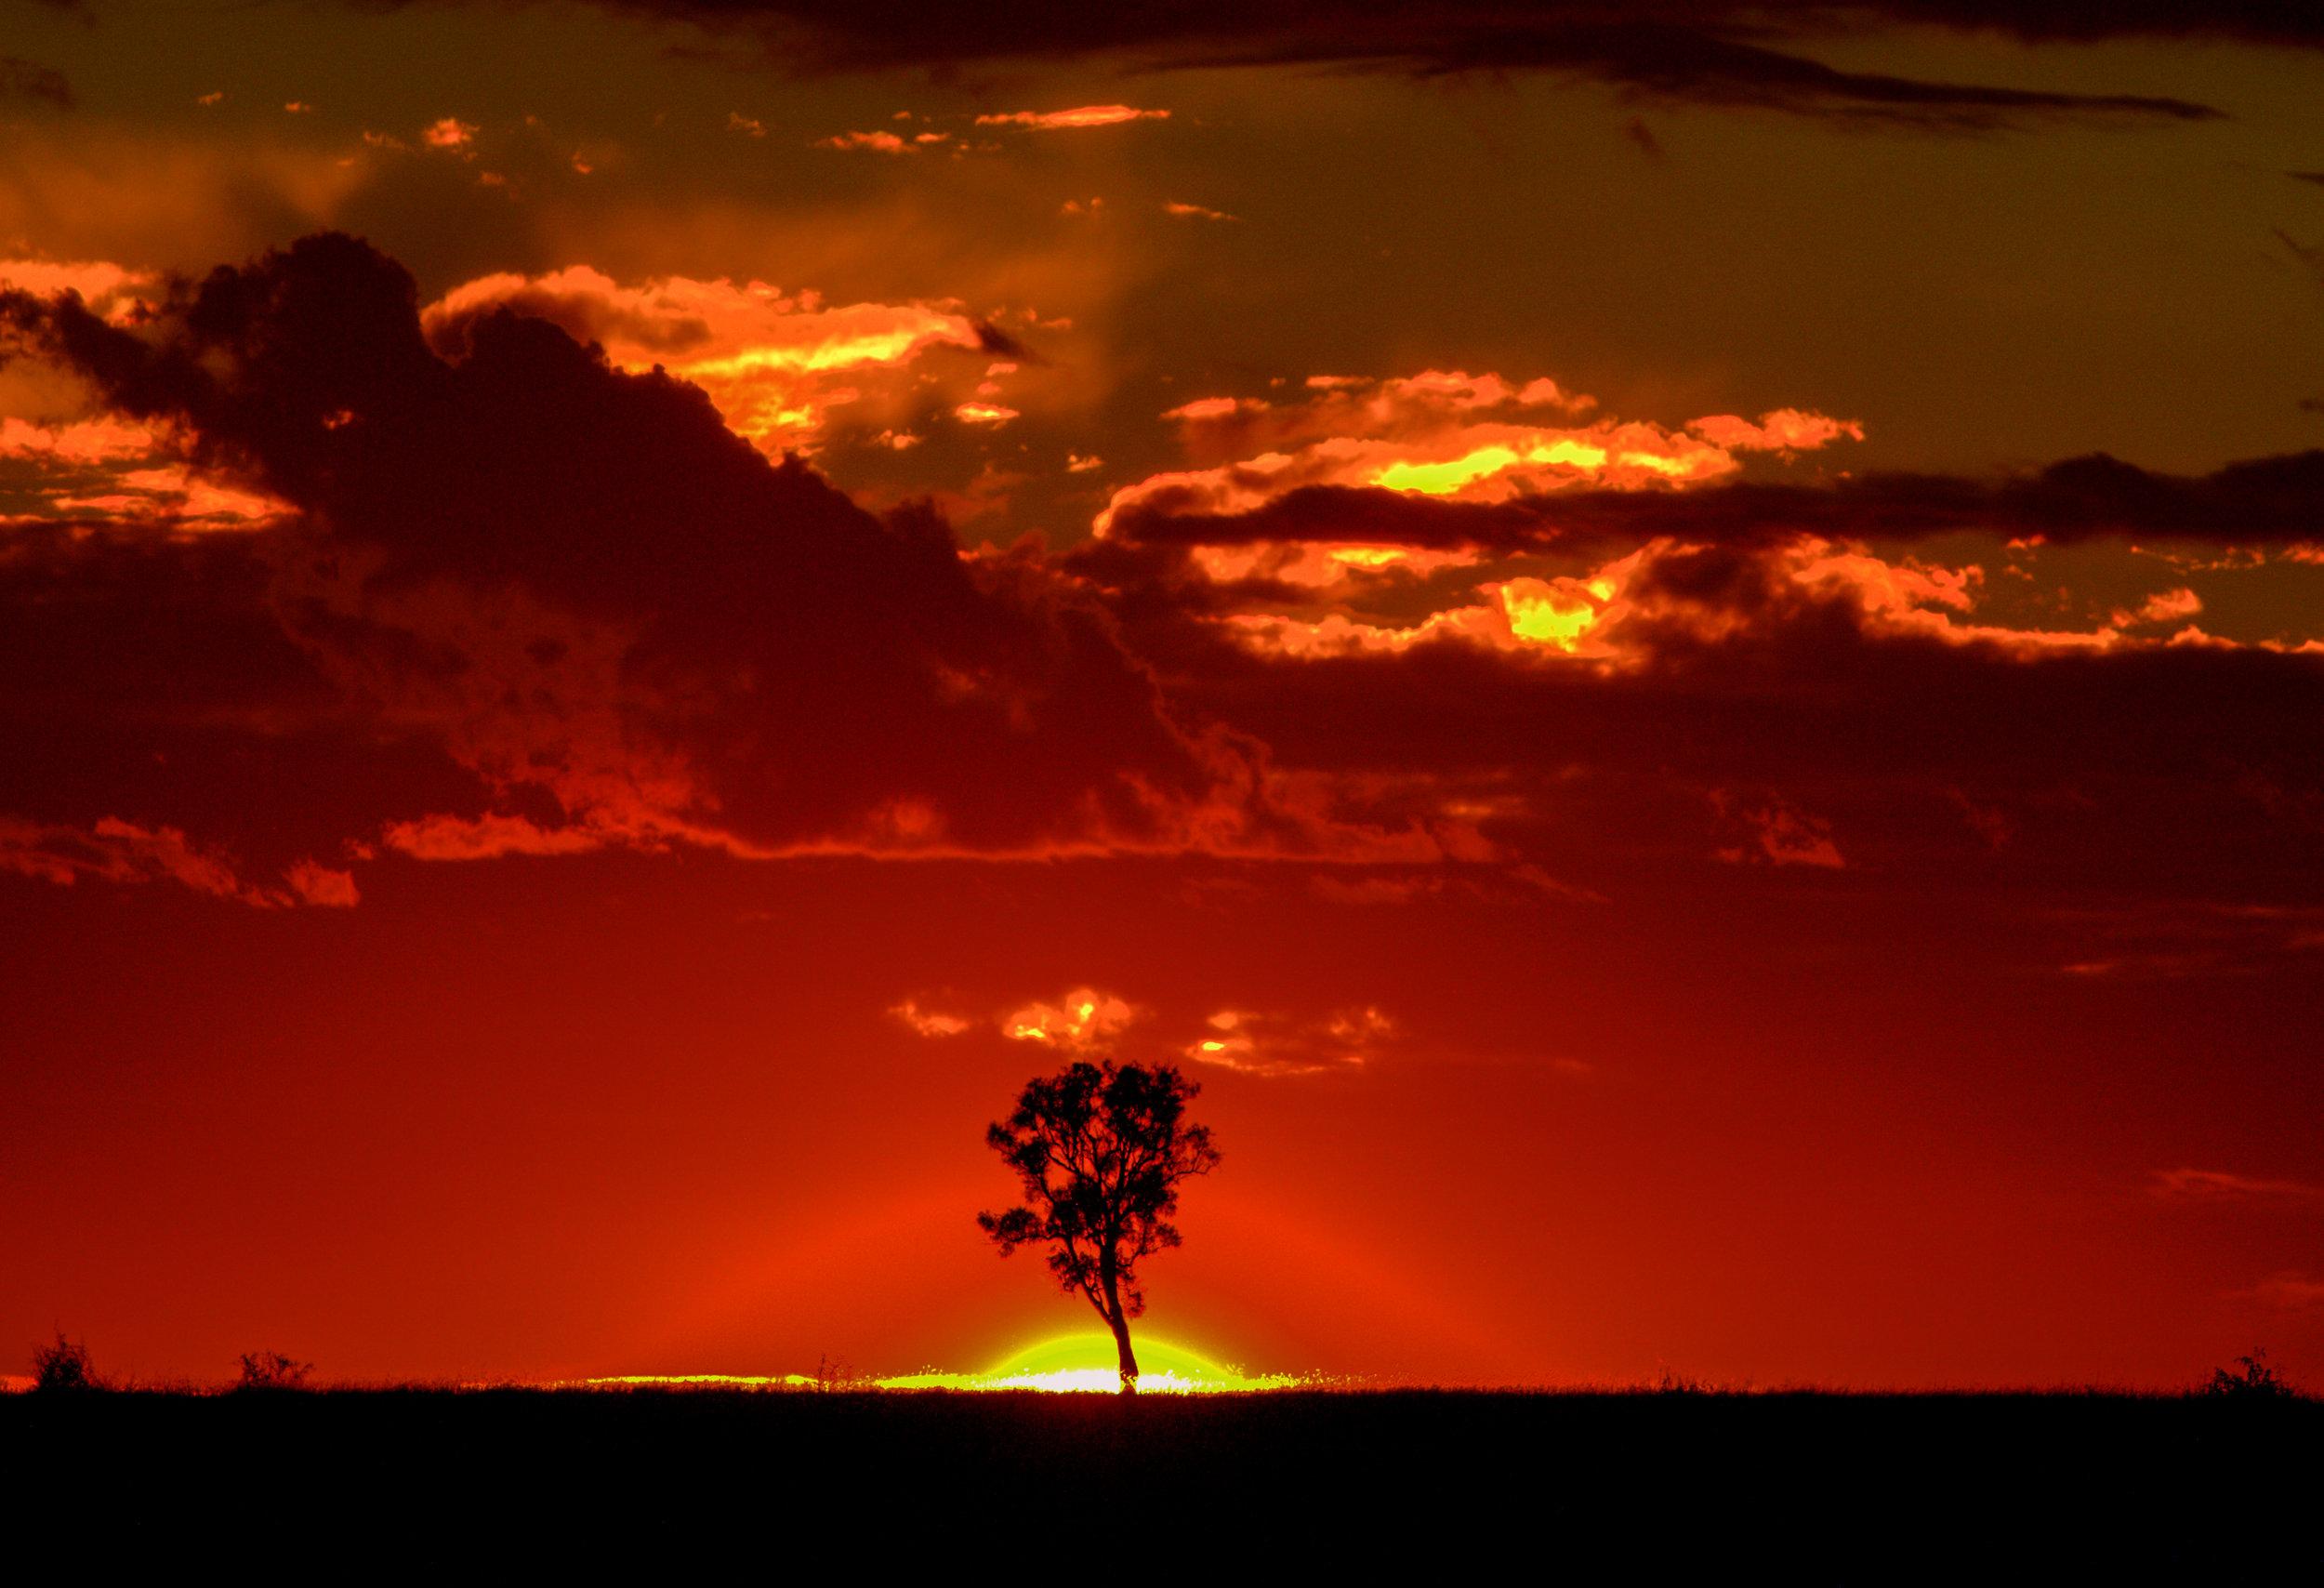 Miles, Australia